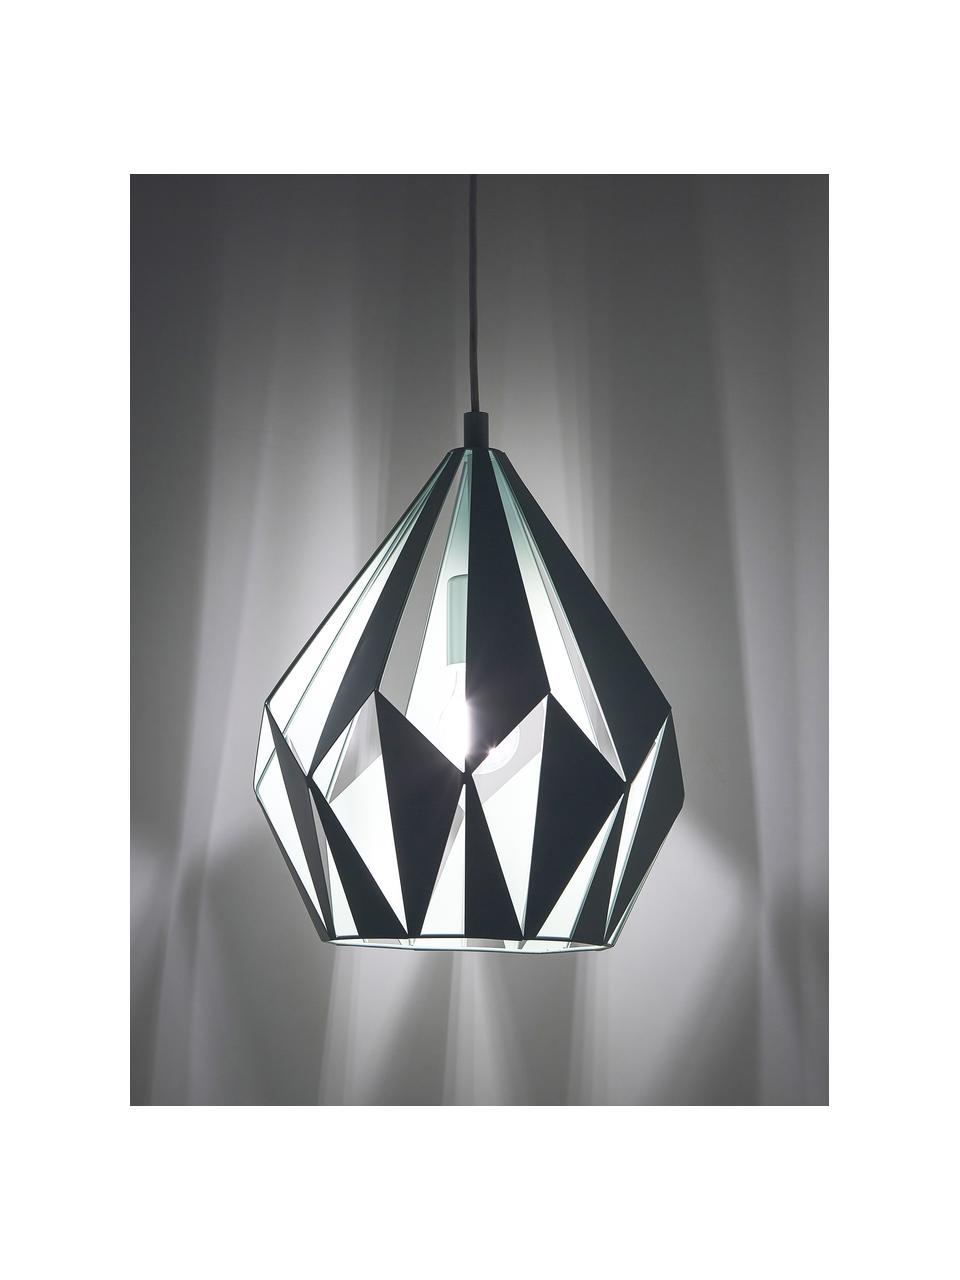 Skandi-Pendelleuchte Carlton, Lampenschirm: Stahl, lackiert, Baldachin: Stahl, lackiert, Hellgrün, Ø 31 x H 40 cm